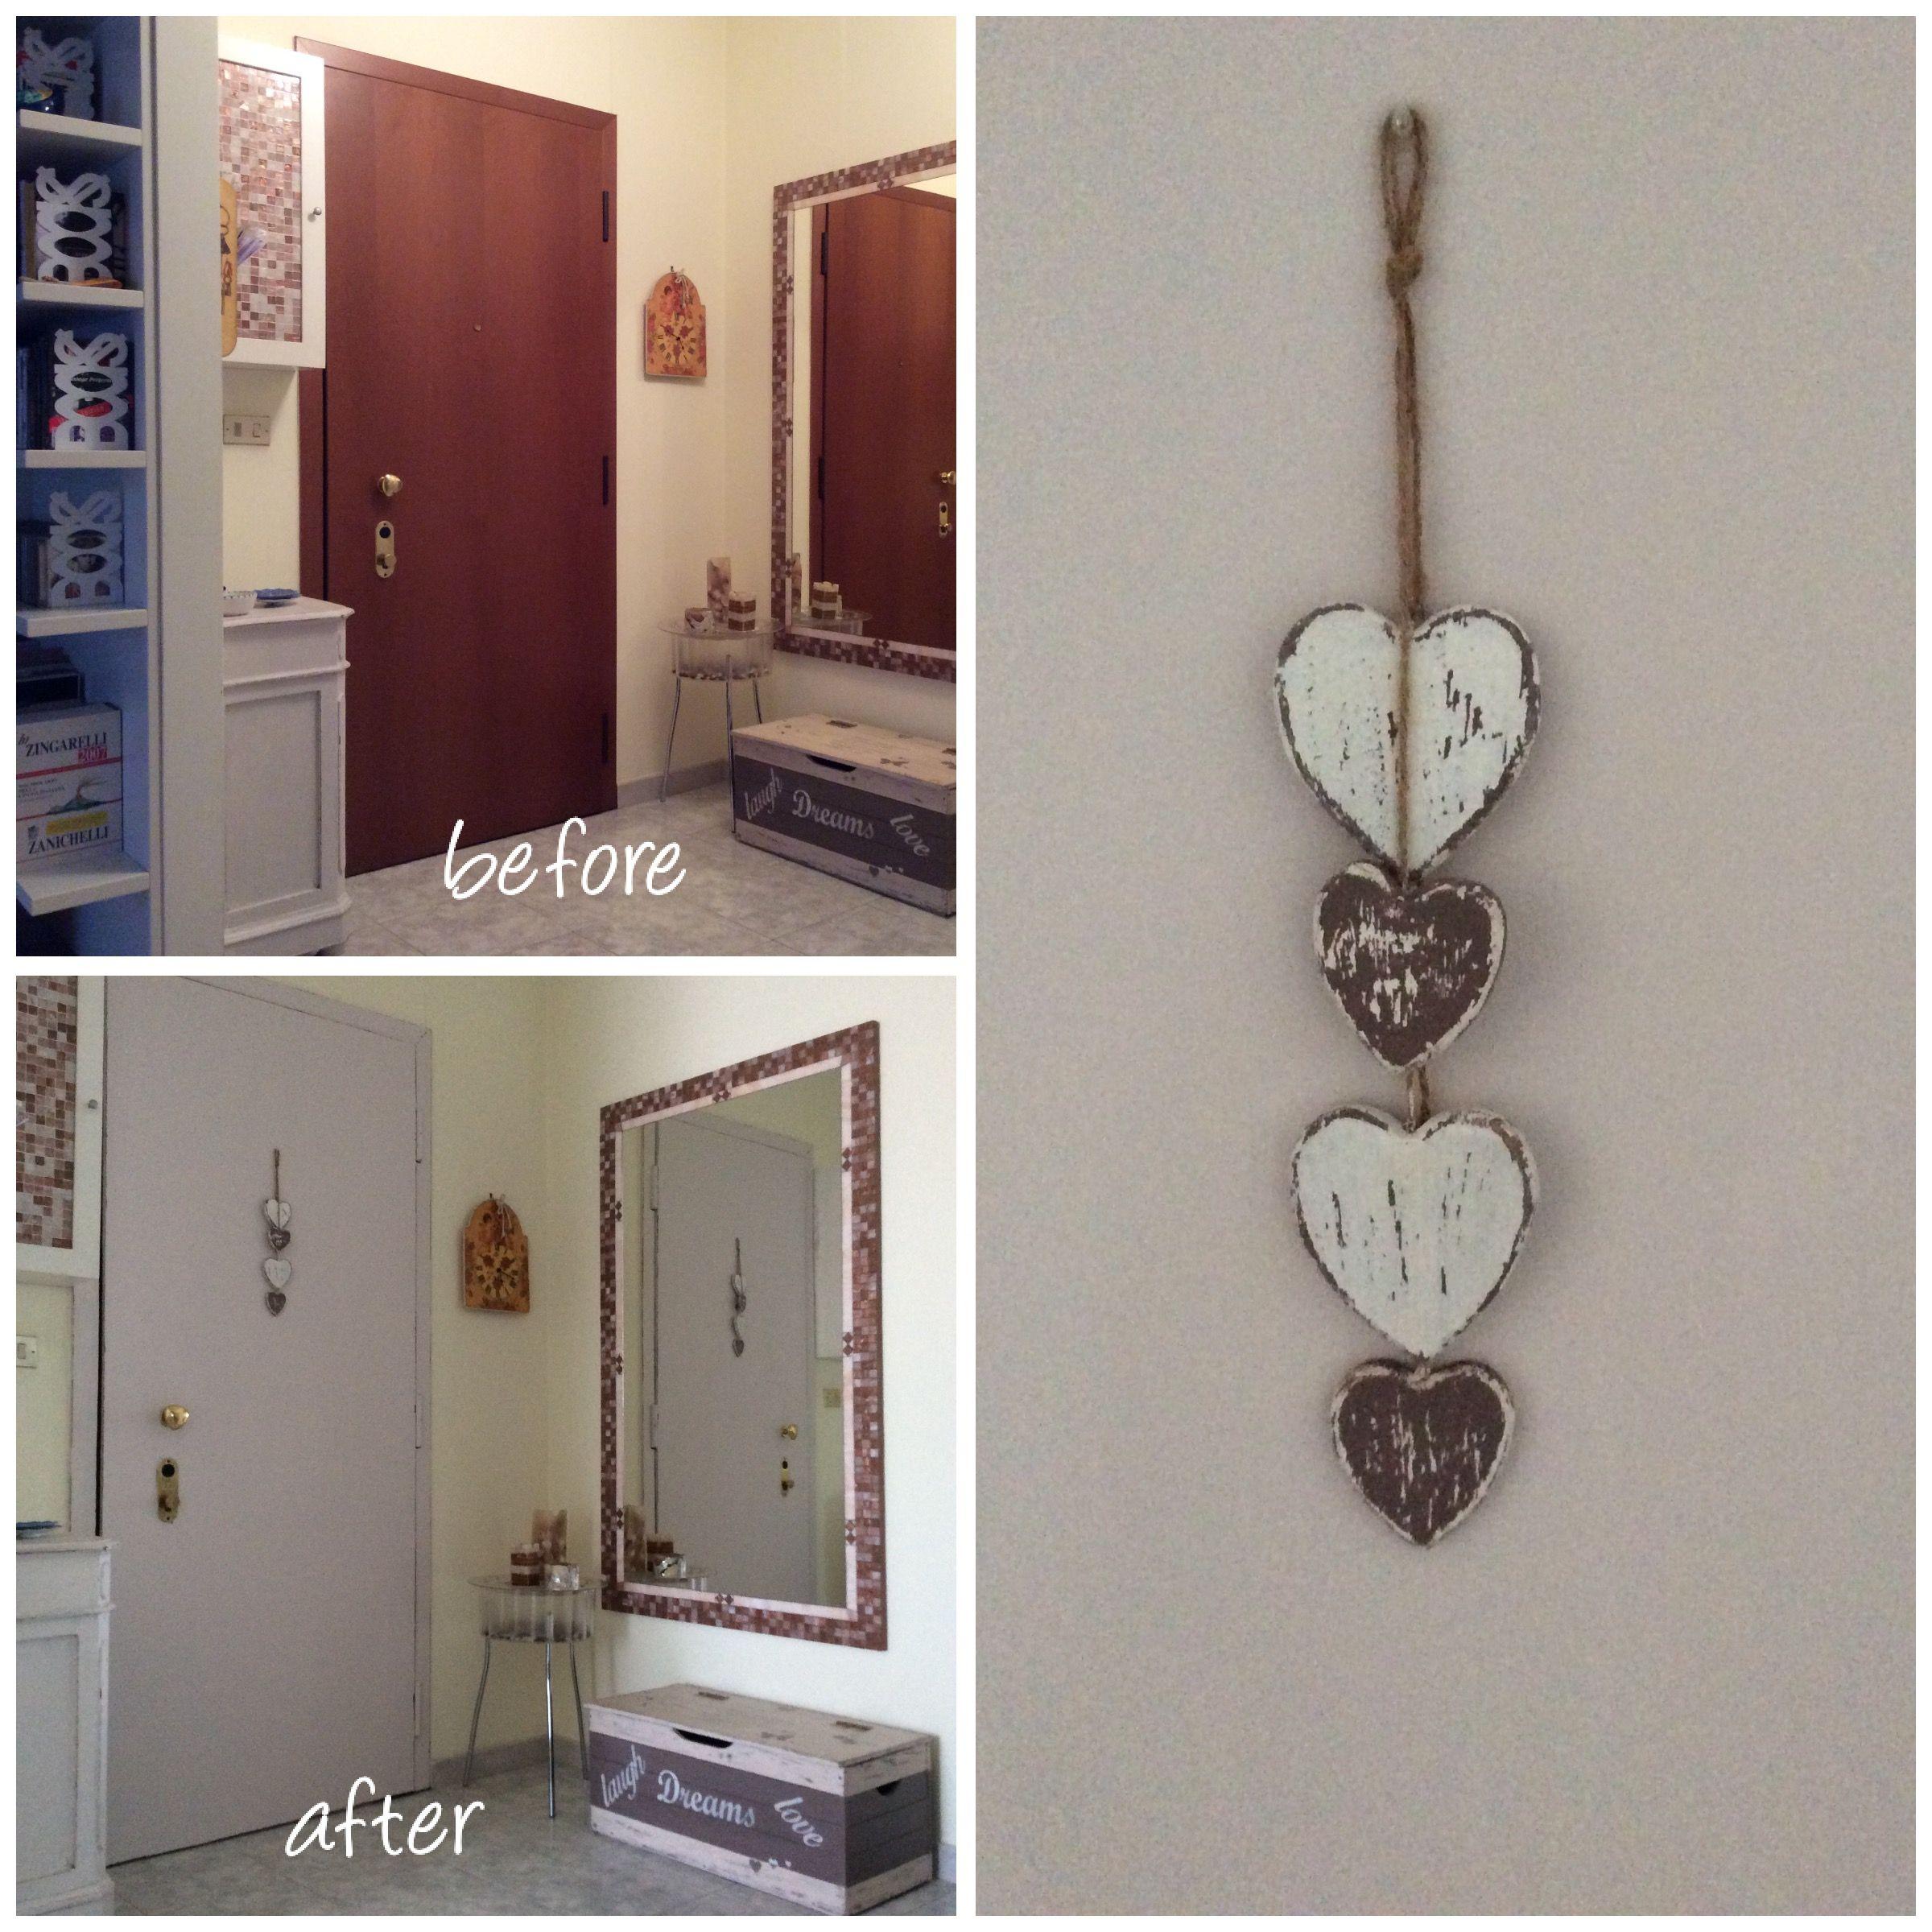 Pittura porta d\'ingresso stile shabby chic | Home decor ...